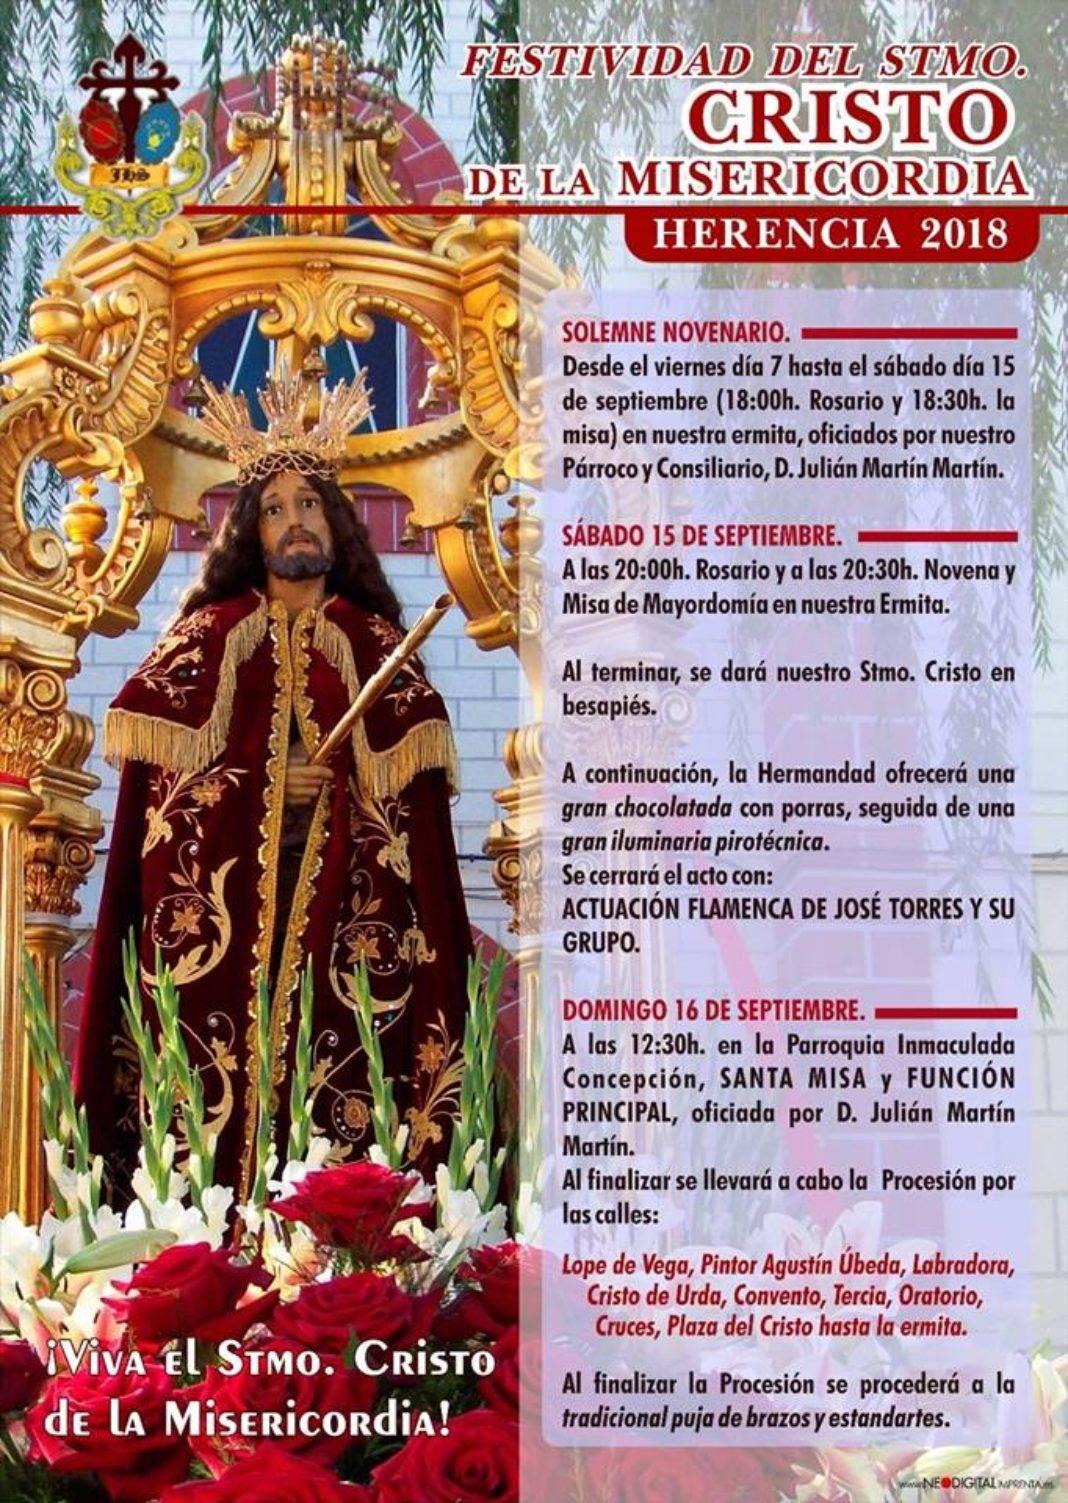 Festividad del Cristo de la Misericordia 1068x1503 - Festividad del Cristo de la Misericordia en Herencia